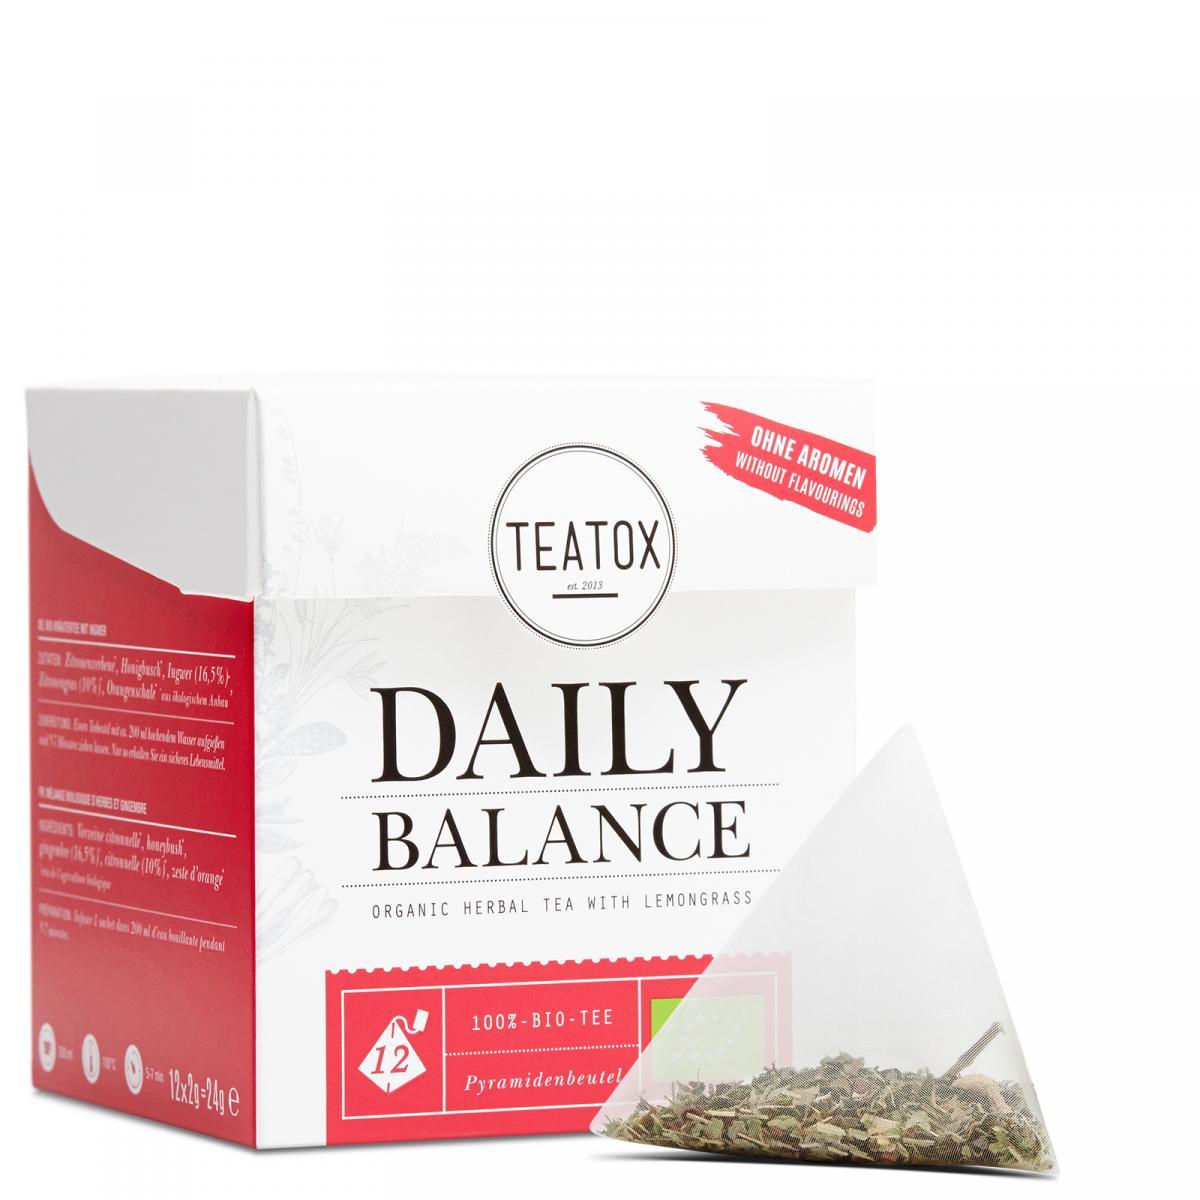 Daily Balance 24g, filteres